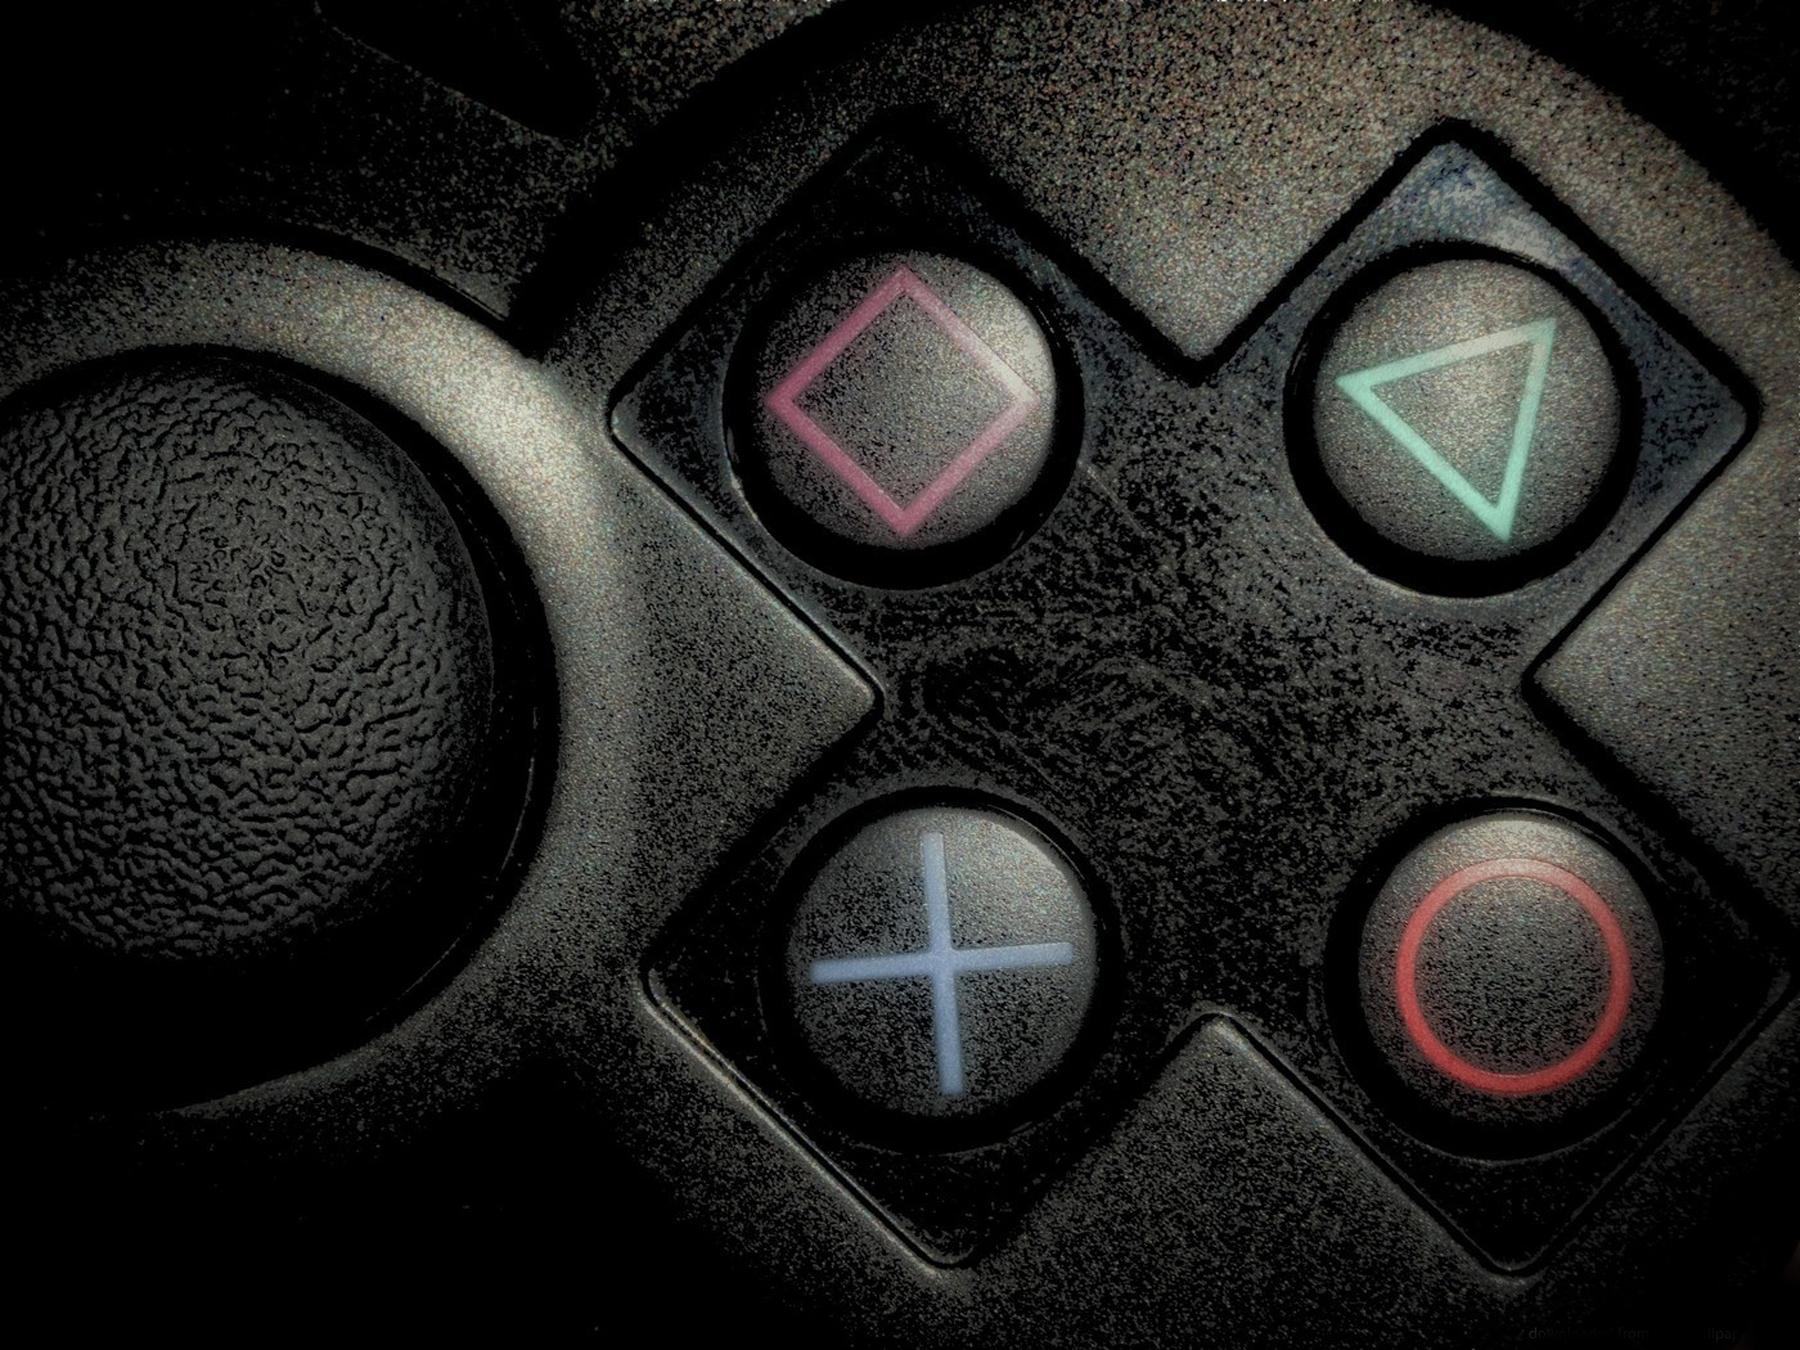 PlayStation Controller Wallpaper